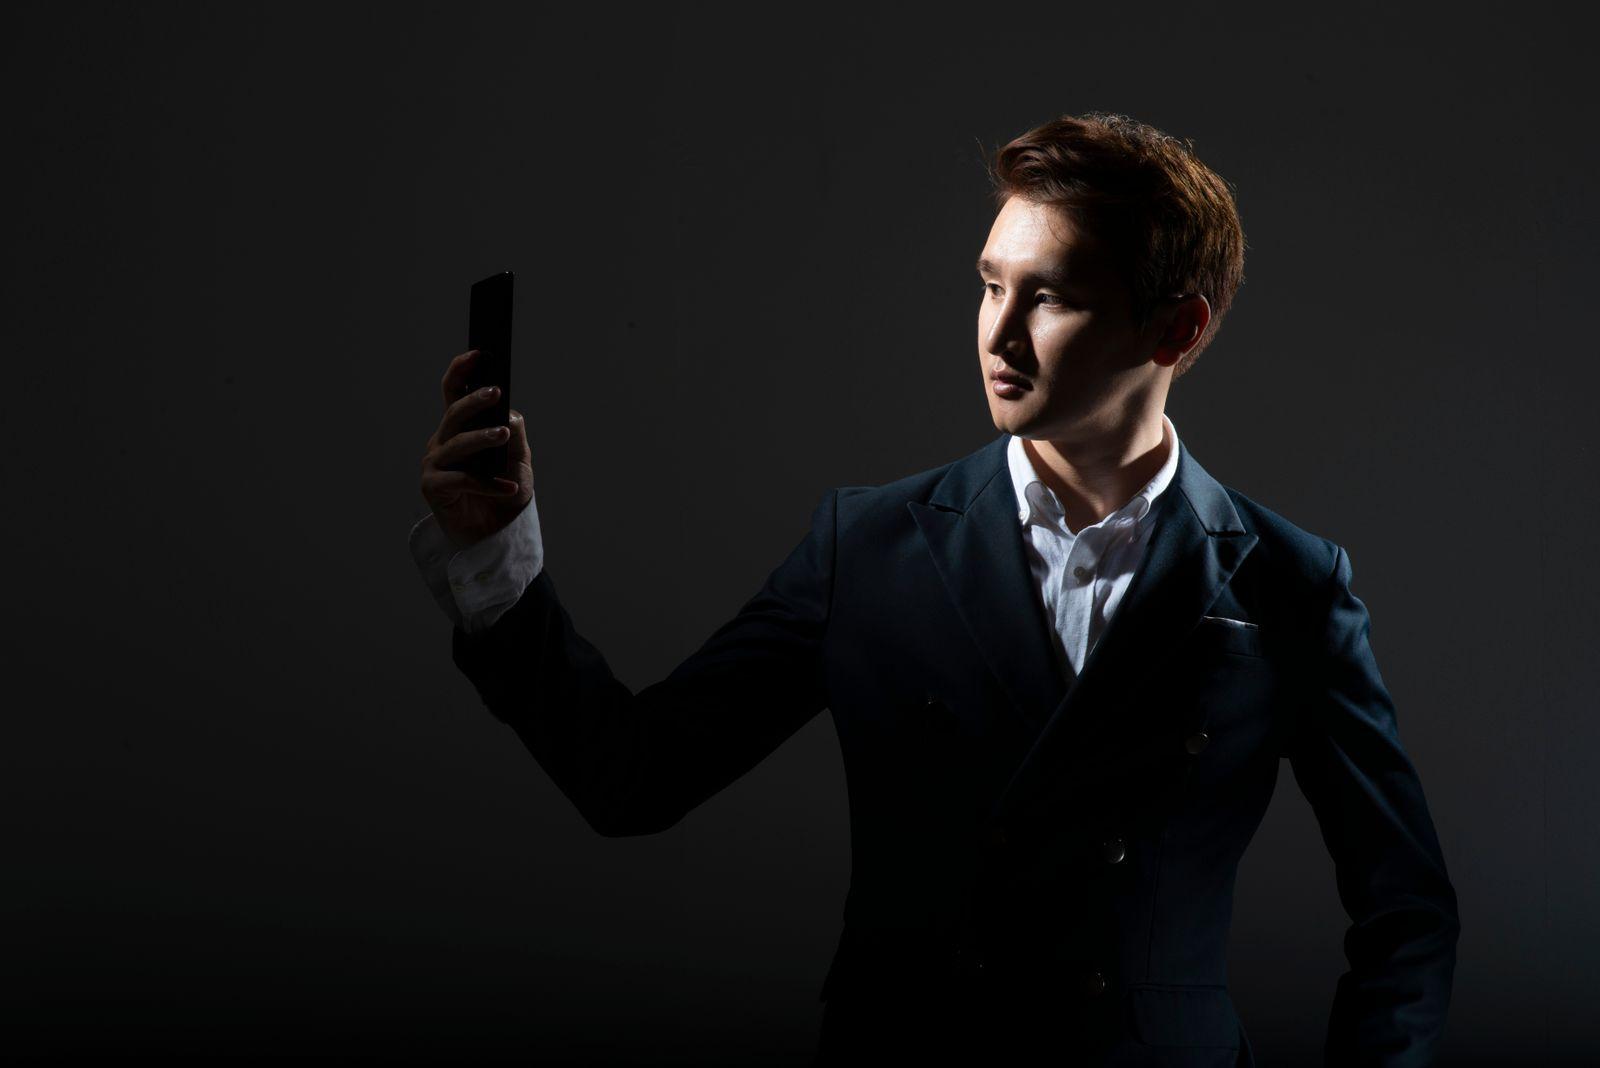 Businessman taking selfie with smartphone